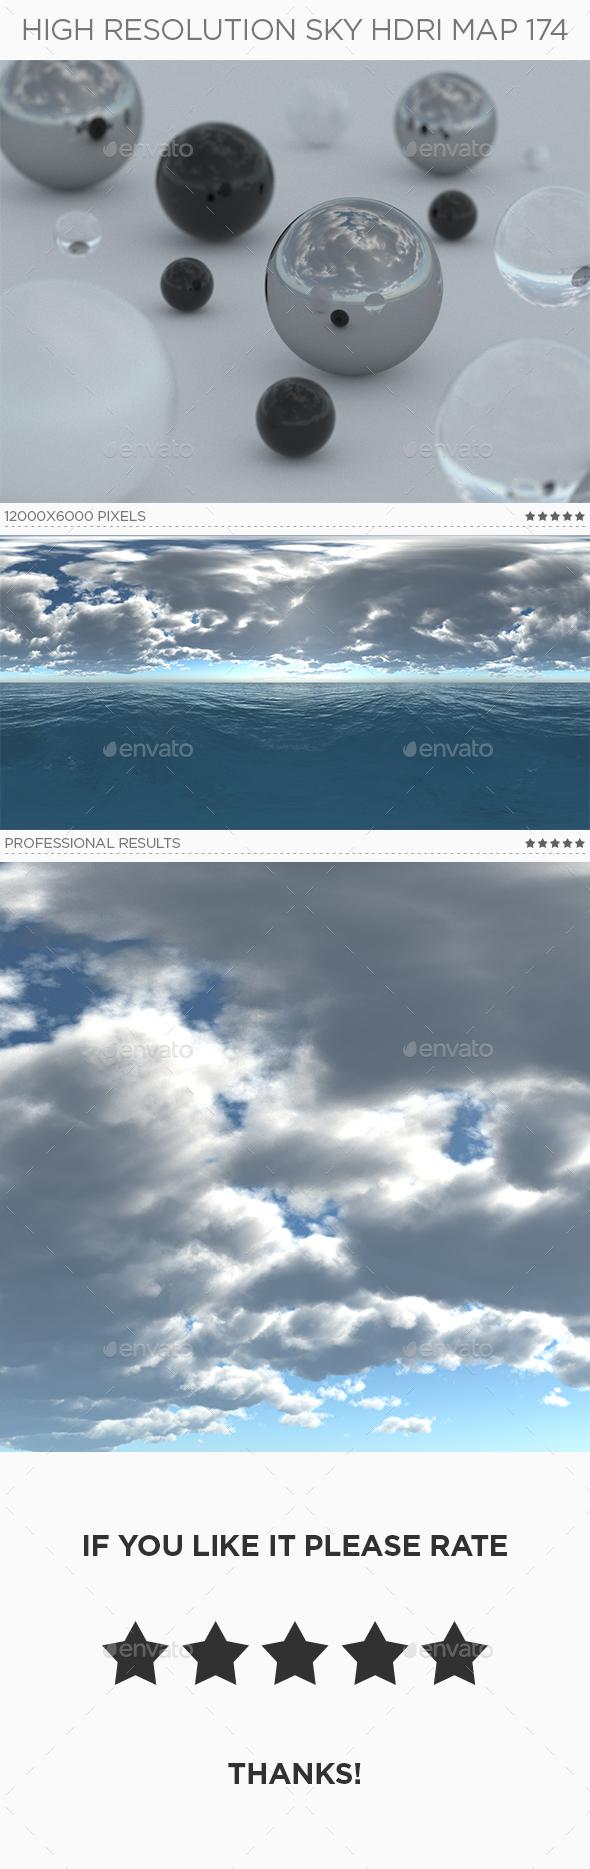 3DOcean High Resolution Sky HDRi Map 174 20981560